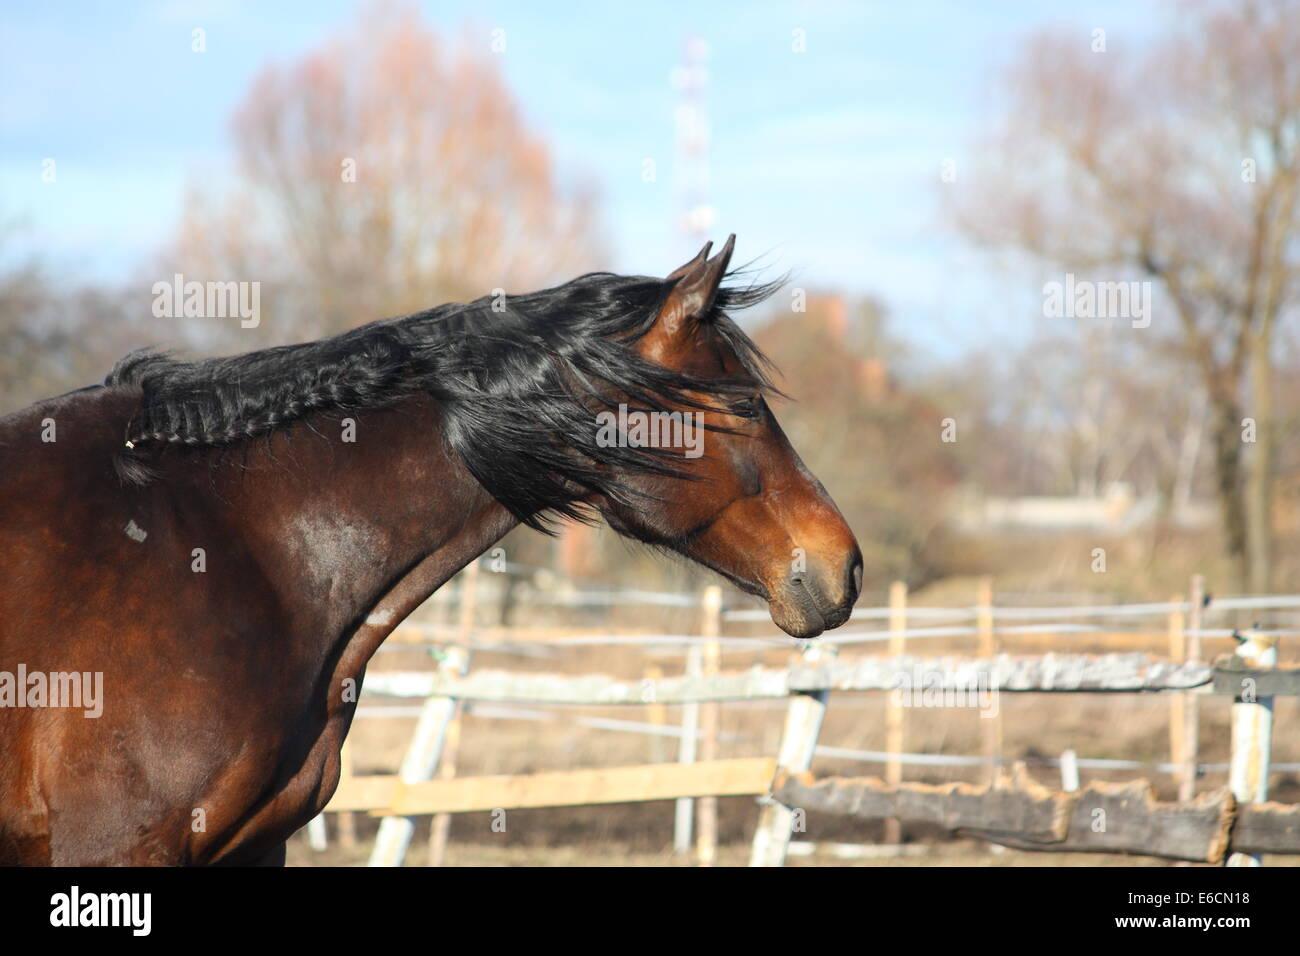 Romantic shot of beautiful bay horse with long mane - Stock Image